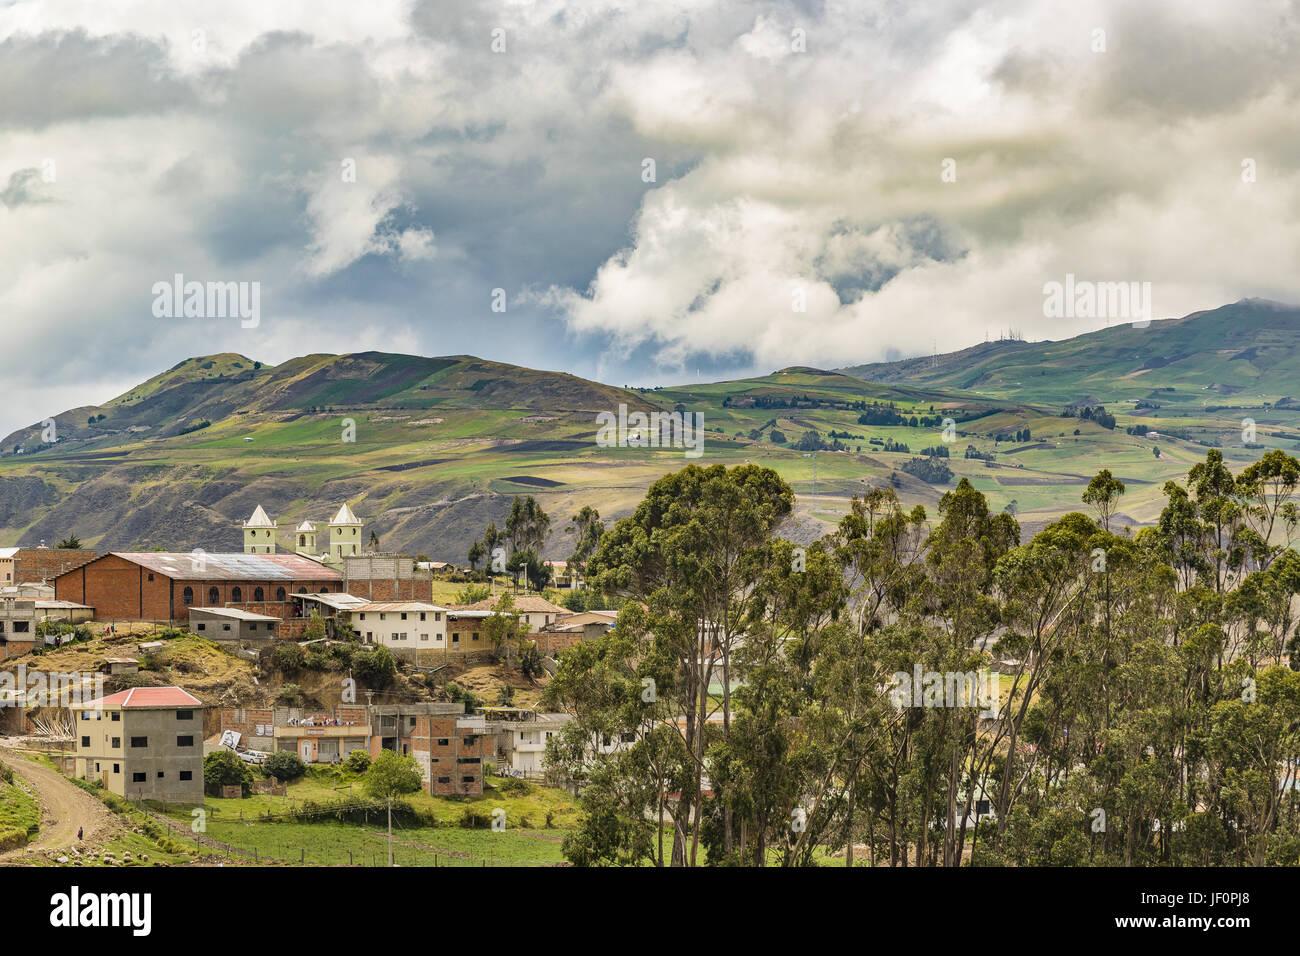 Anden Stadt Landschaft Szene Azuay Ecuador Stockbild